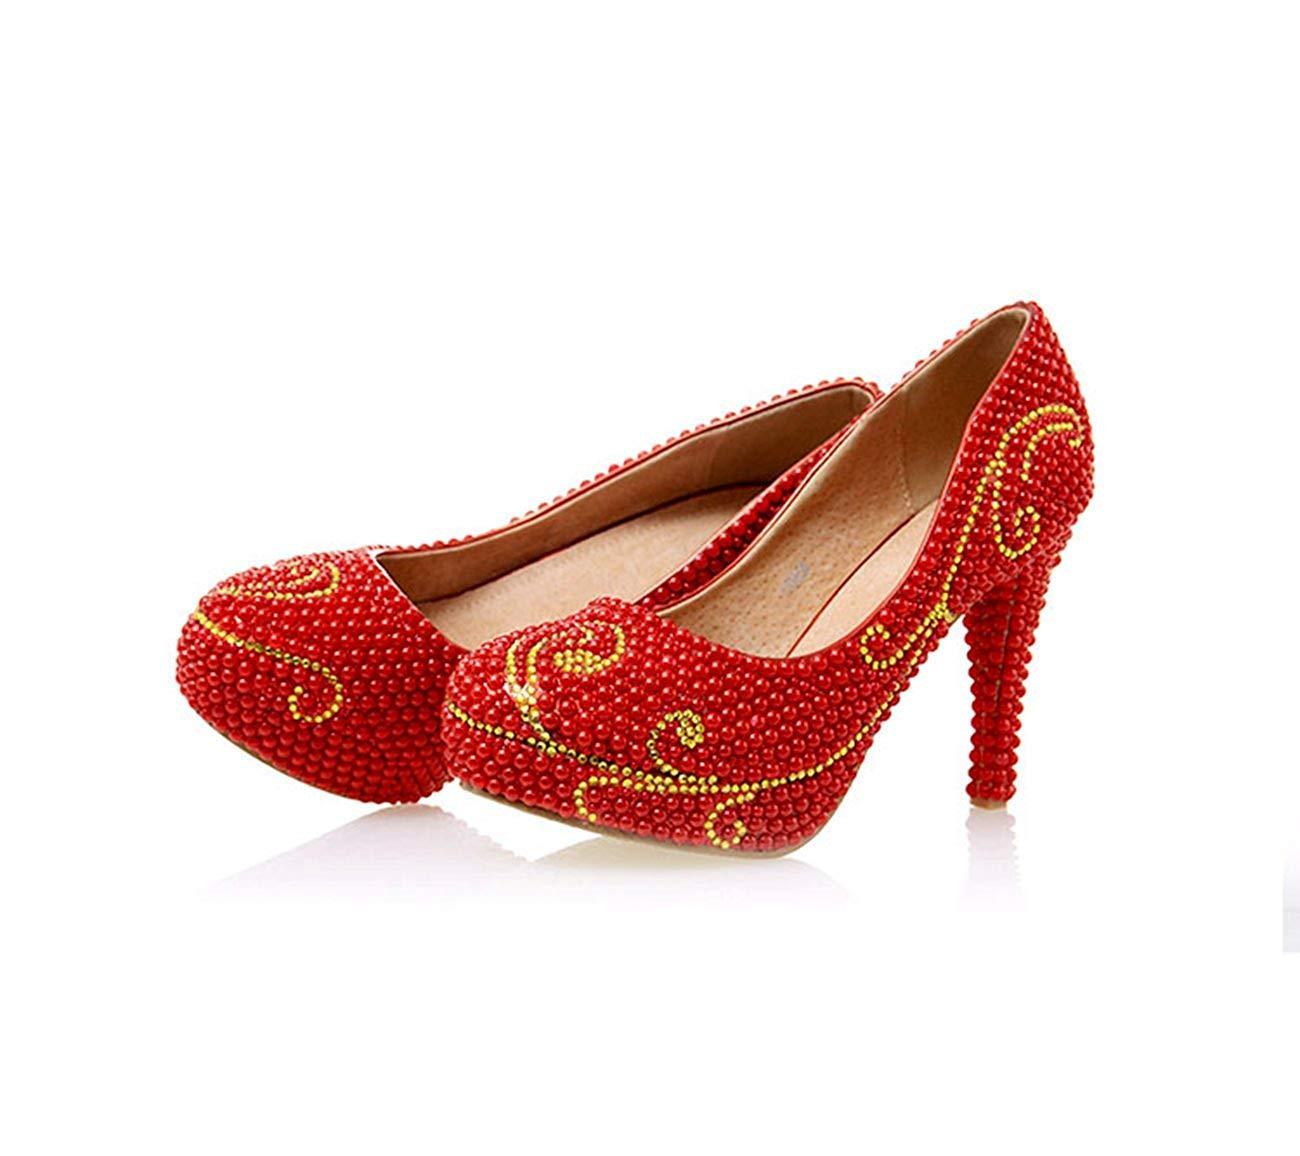 ZHRUI Damen Perle Perle Perle Perlen 4 Heel rot Wedding Performance Pumps Schuhe UK 3 (Farbe   -, Größe   -) e561a5